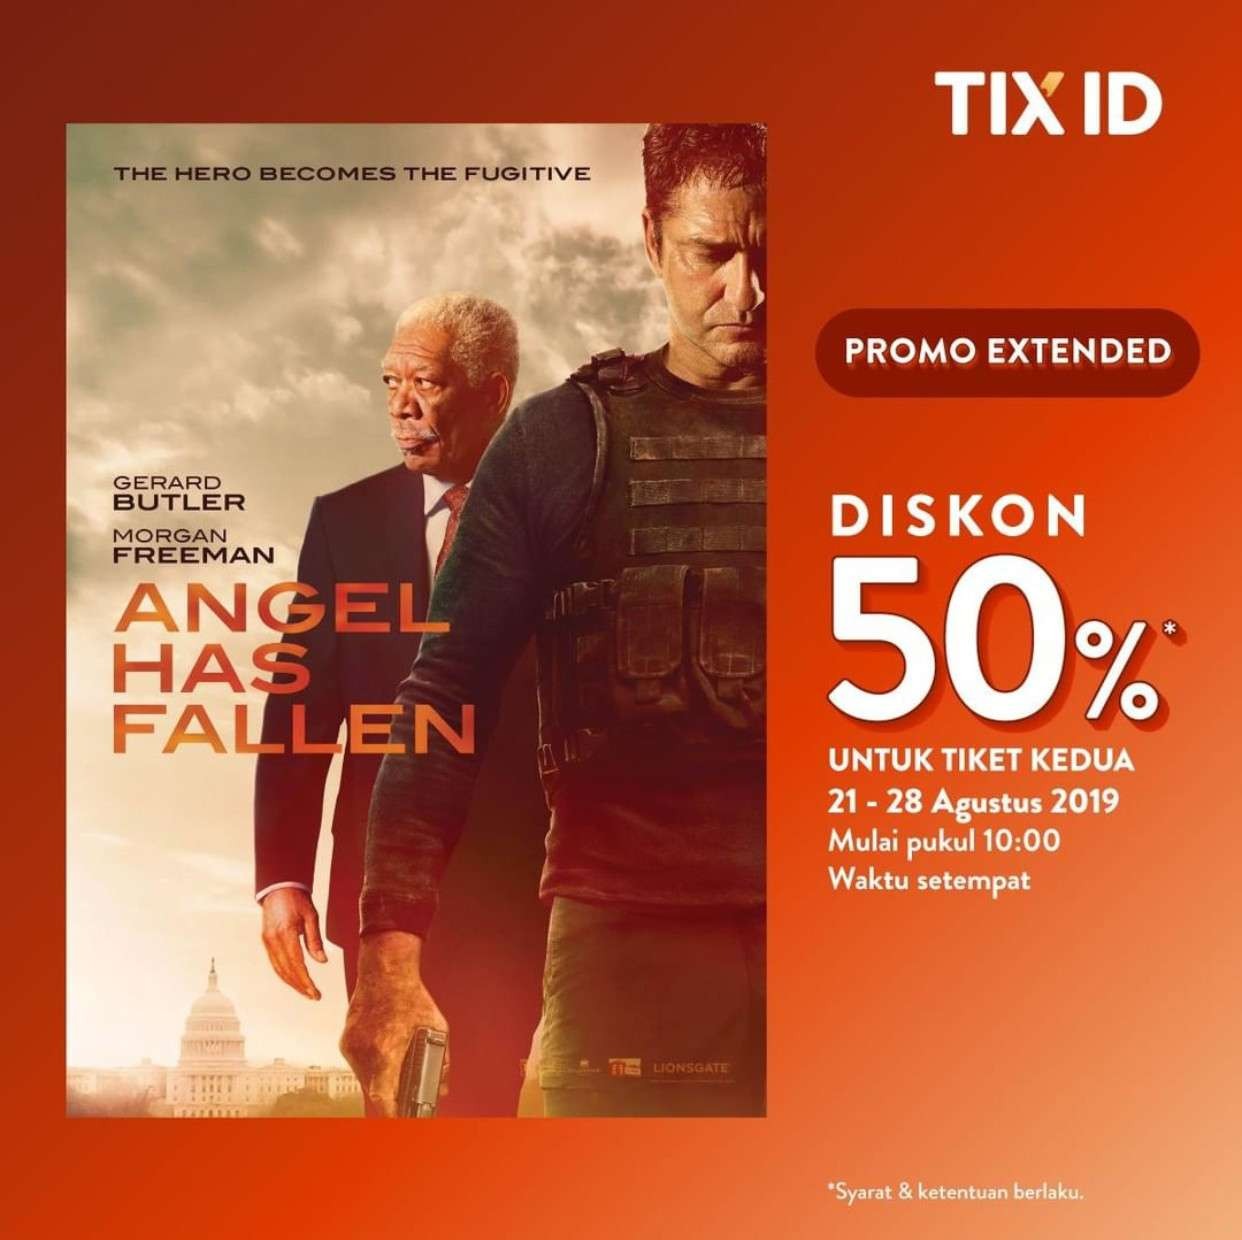 TIX ID Promo Diskon 50% Film Angel Has Fallen